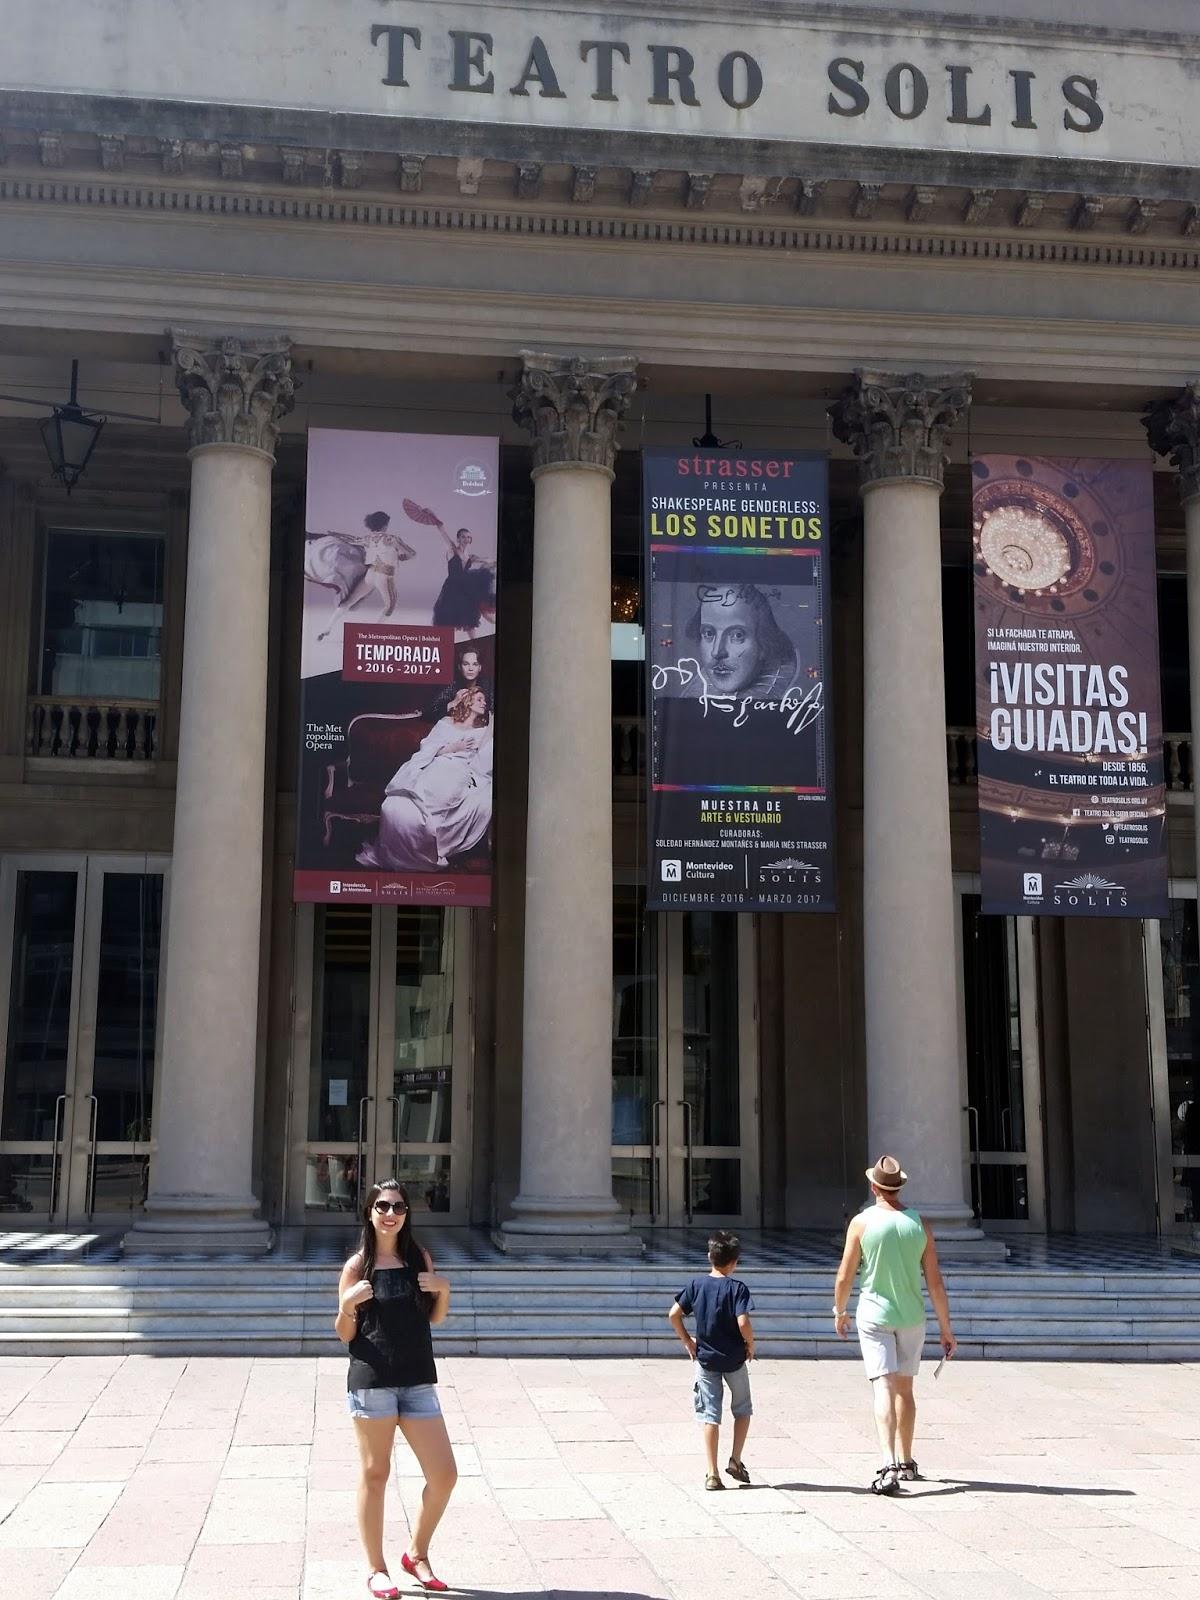 Teatro Sólis